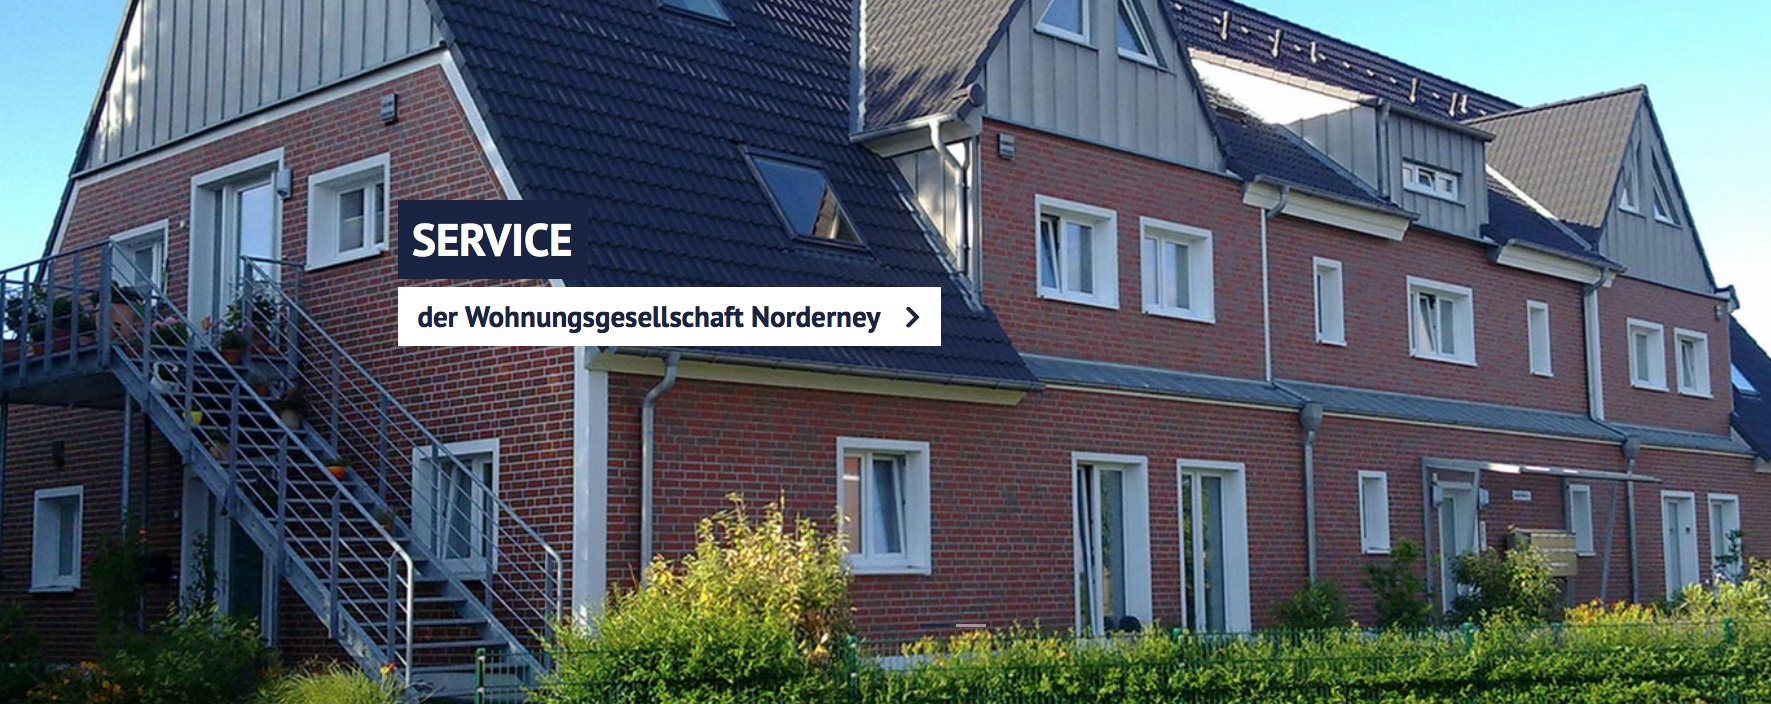 Neubau Wohnungsgesellschaft